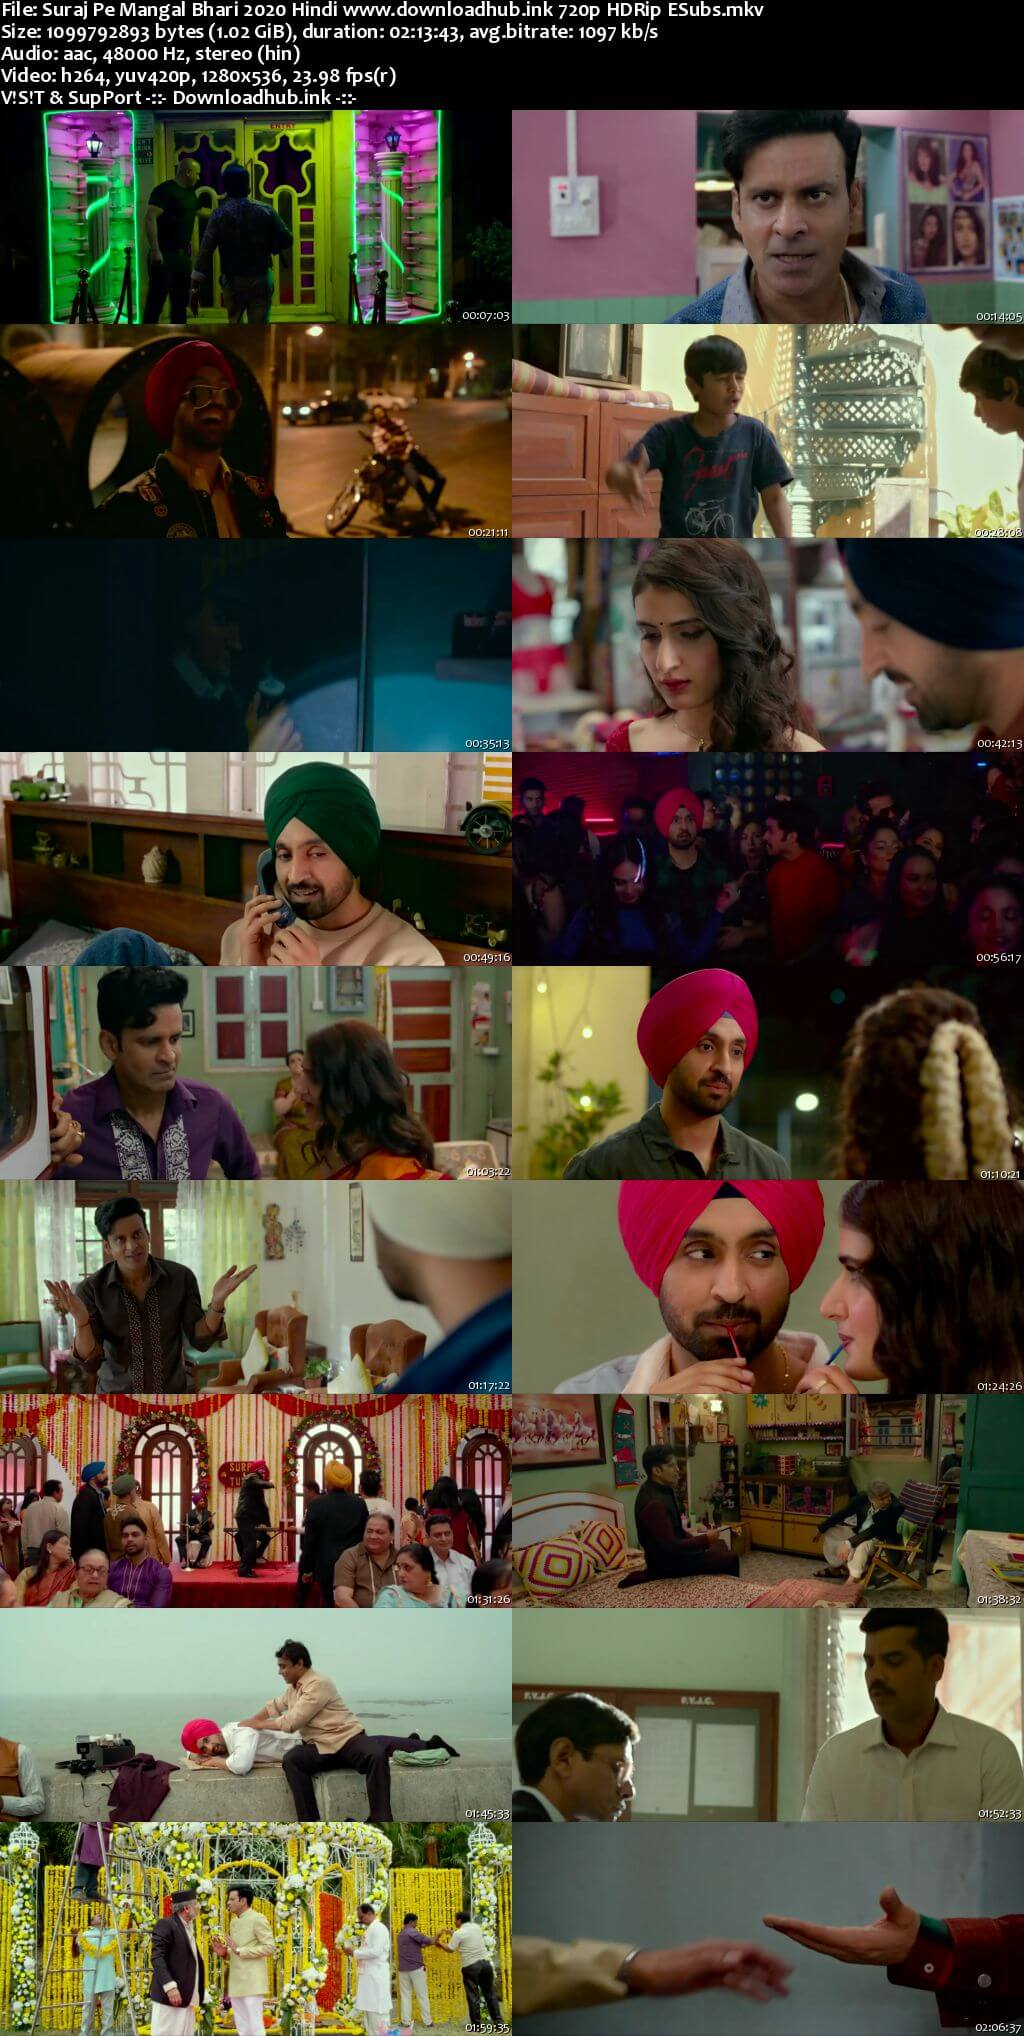 Suraj Pe Mangal Bhari 2020 Hindi 720p HDRip ESubs